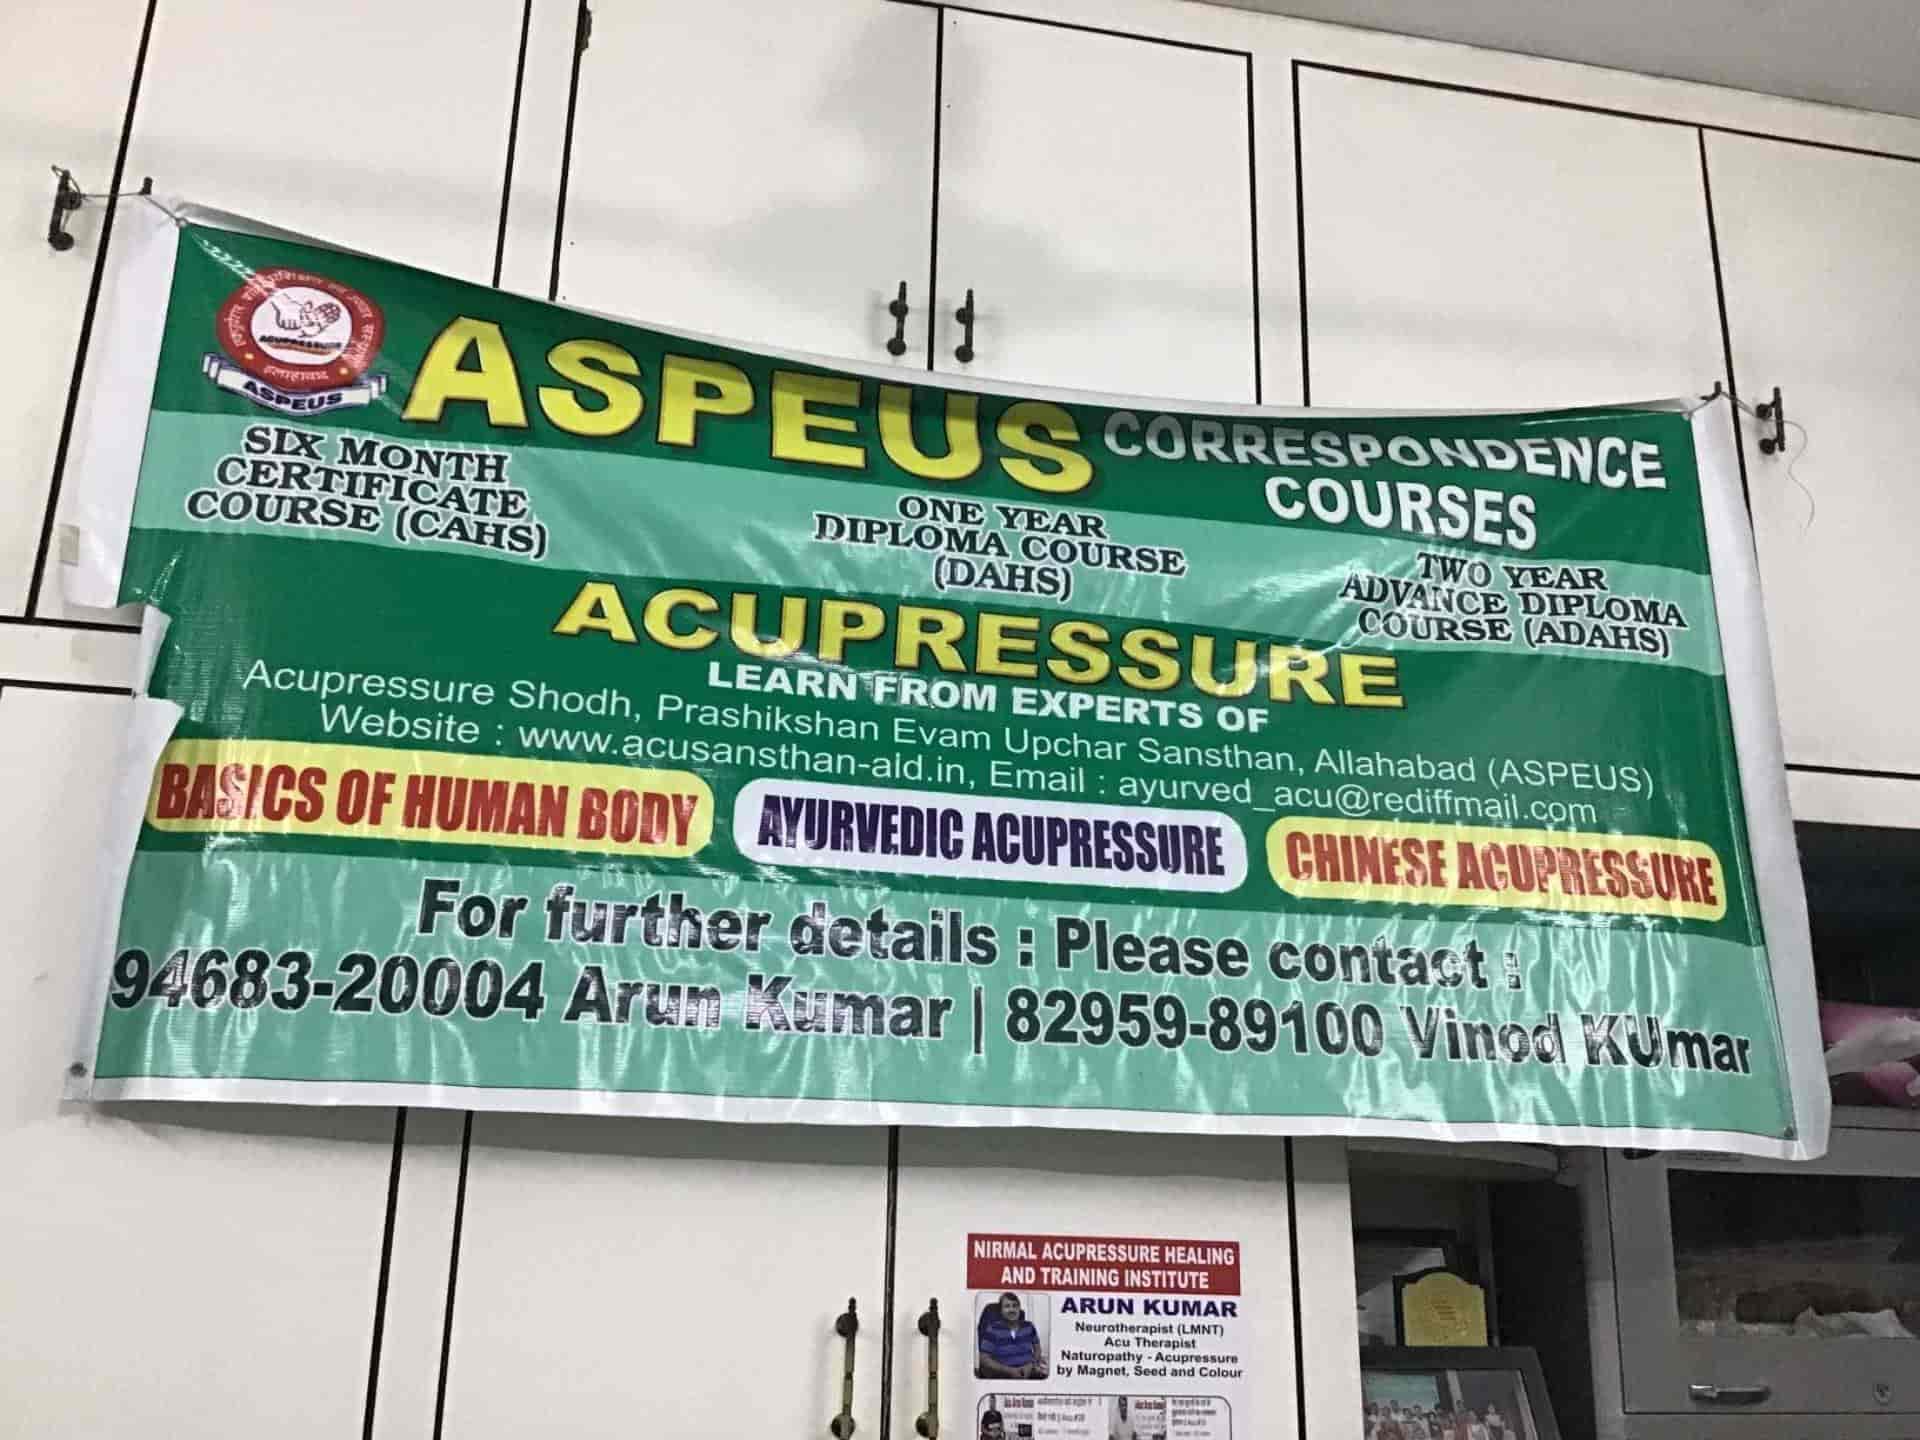 Nirmal Acupressure Healing And Training Institute